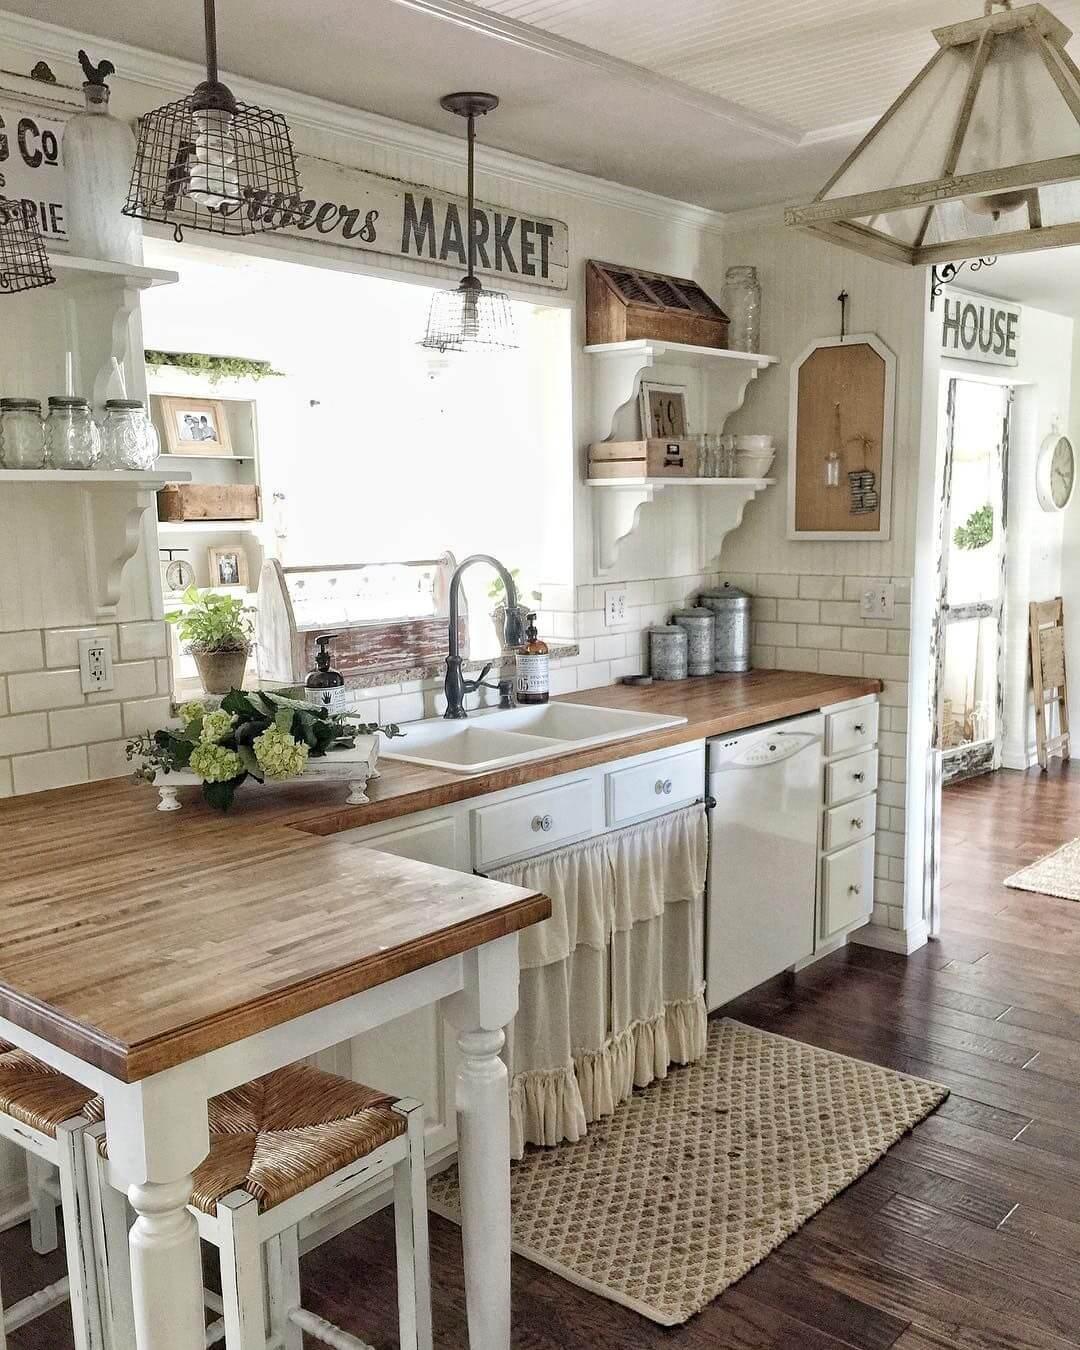 01-farmhouse-kitchen-cabinet-ideas-homebnc